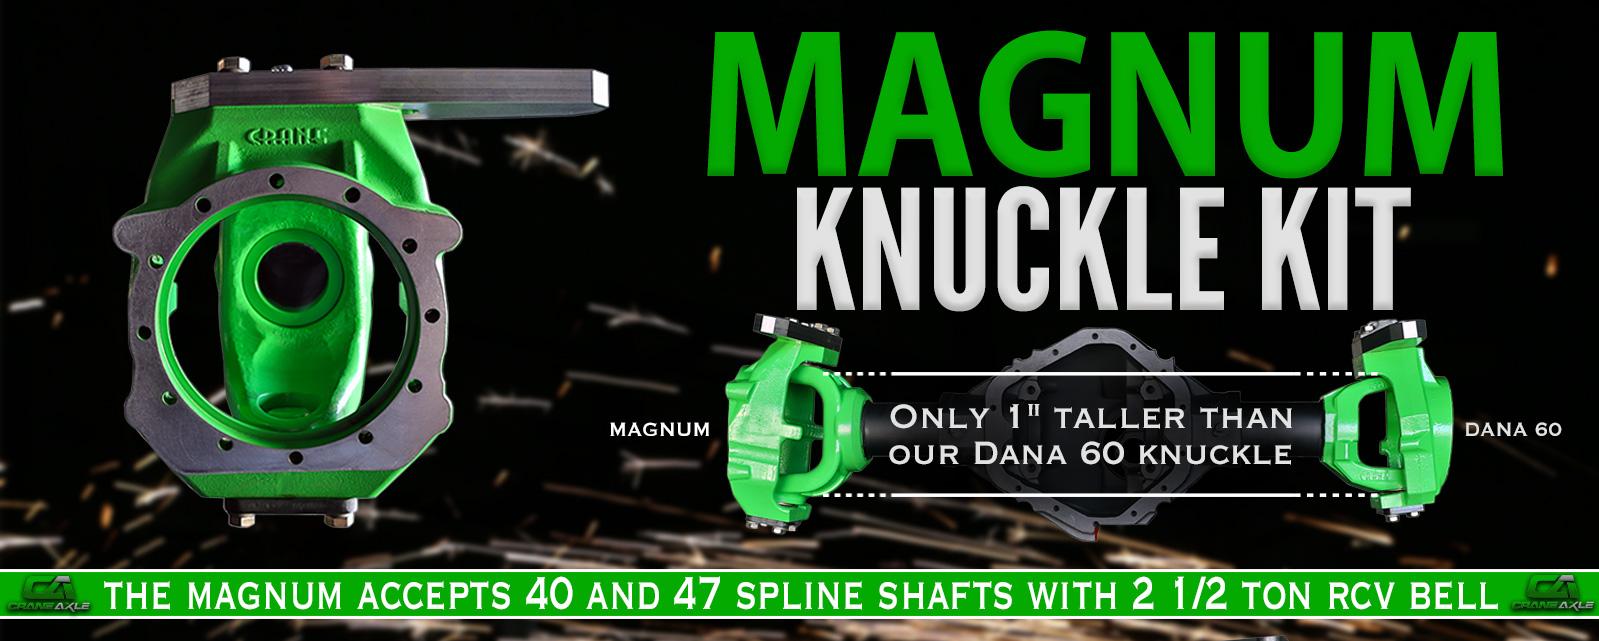 Magnum Knuckle